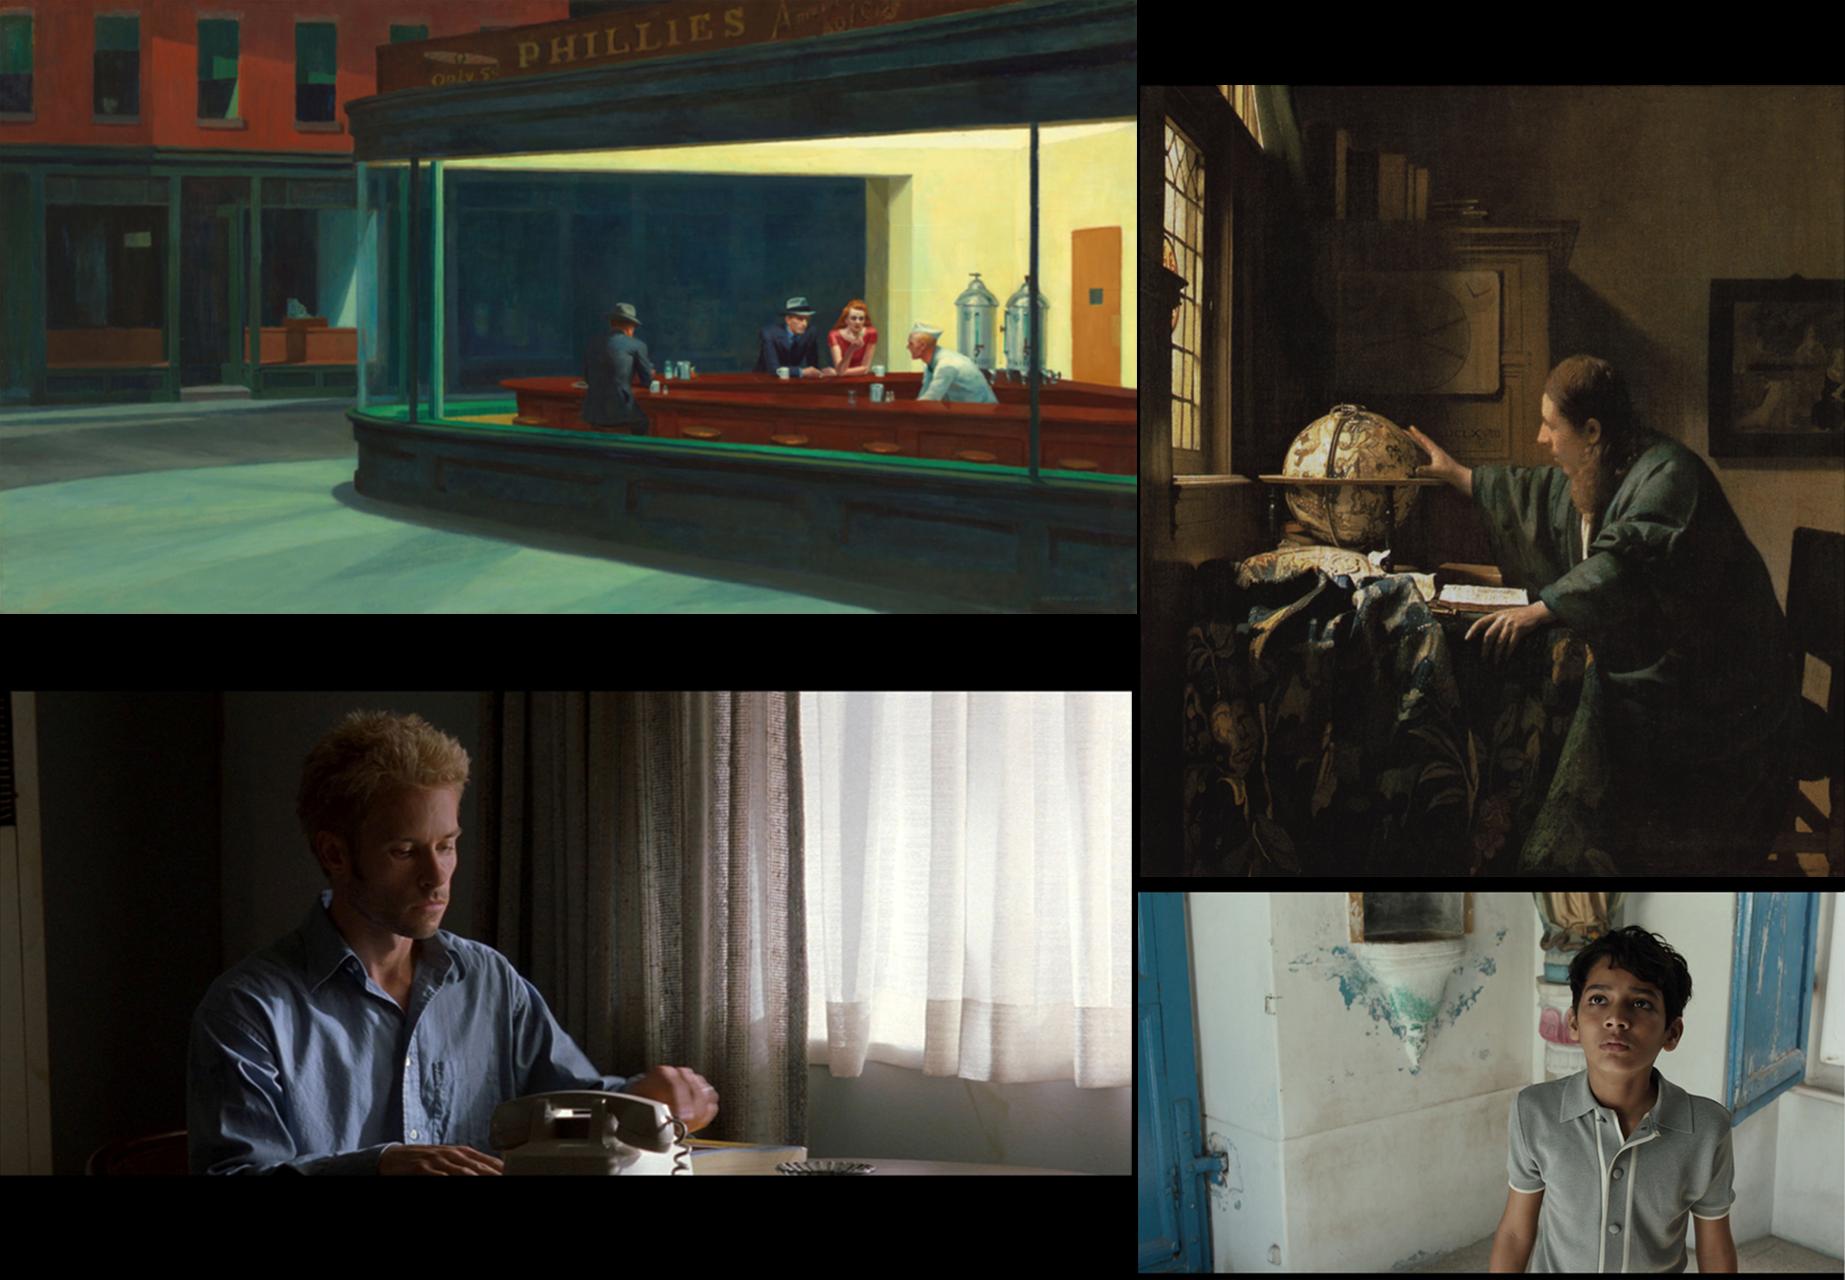 'Nighthawks' (1942), Edward Hopper 'De astronoom' (1668), Johannes Vermeer 'Memento' (2000), d. Christopher Nolan, DP: Wally Pfister, Panavision 35mm CS 1:2.35 'Life of Pi' (2012), d. Ang Lee, DP: Claudio Miranda, Alexa Arriraw, Master 2K